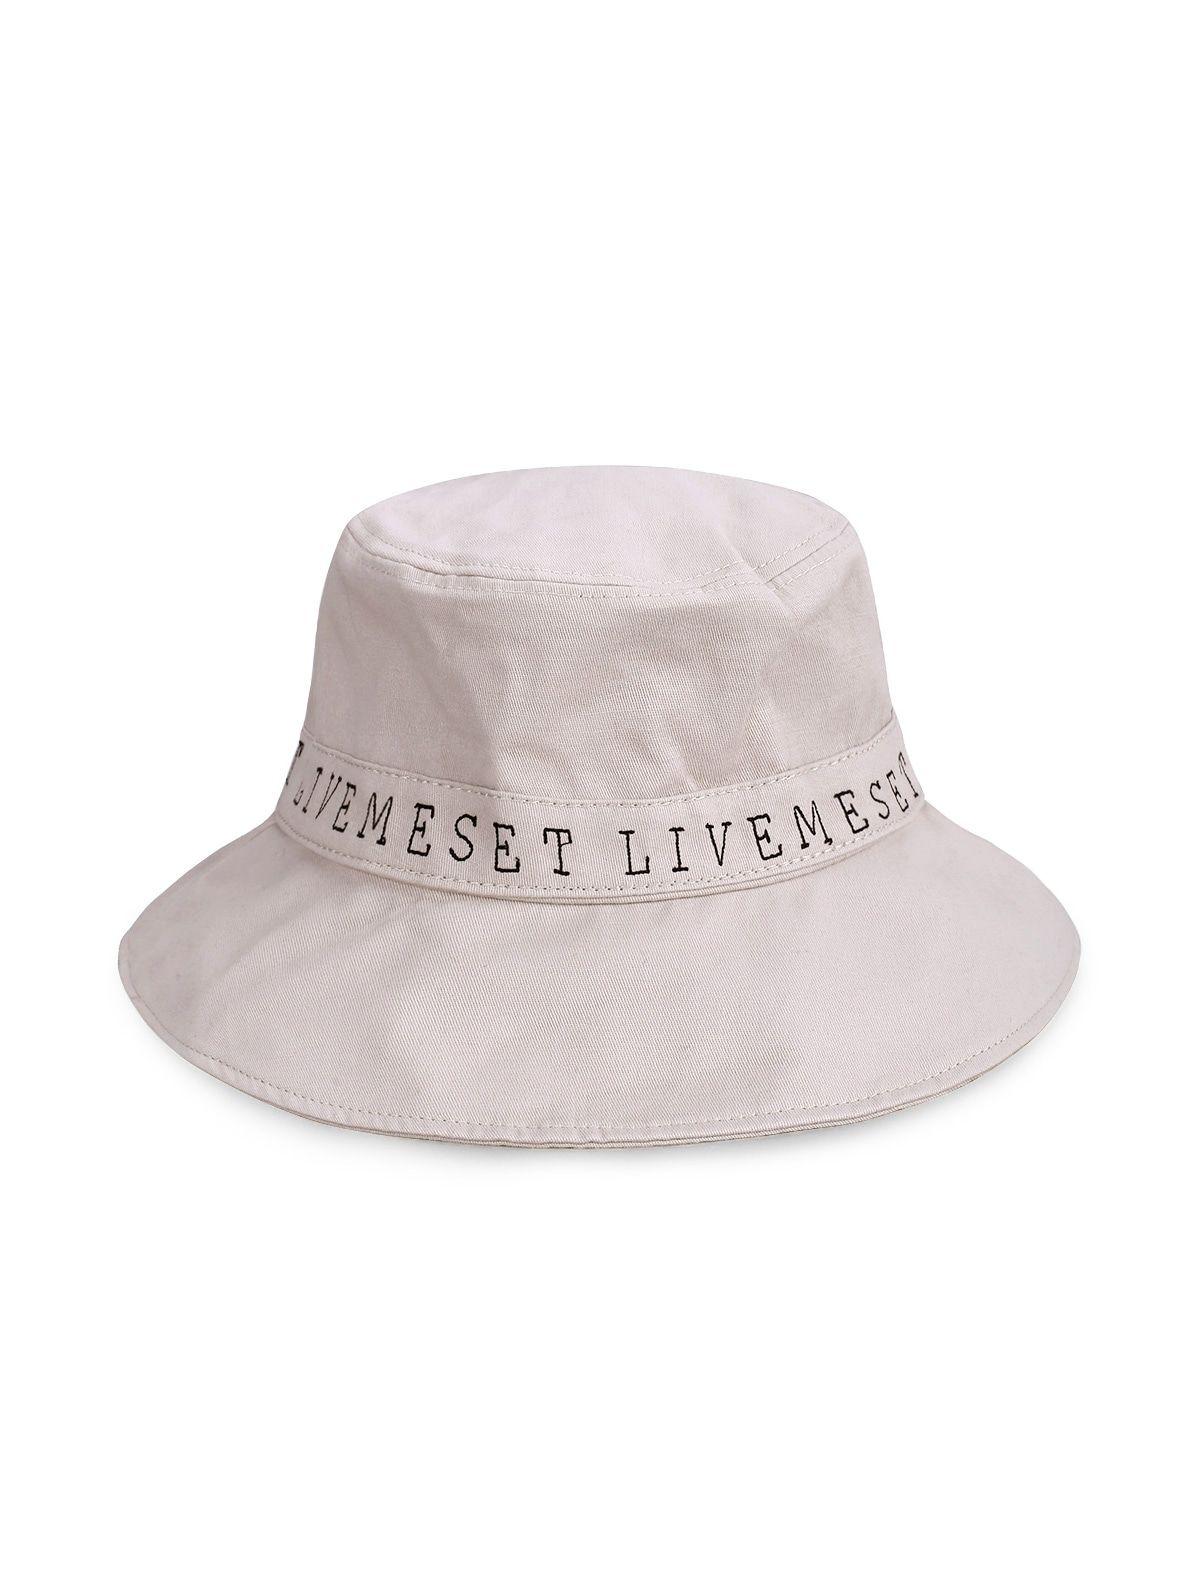 Plain Letter Print Bucket Hat Beige Black Light Khaki Yellow Letter Prints Beige Hat Types